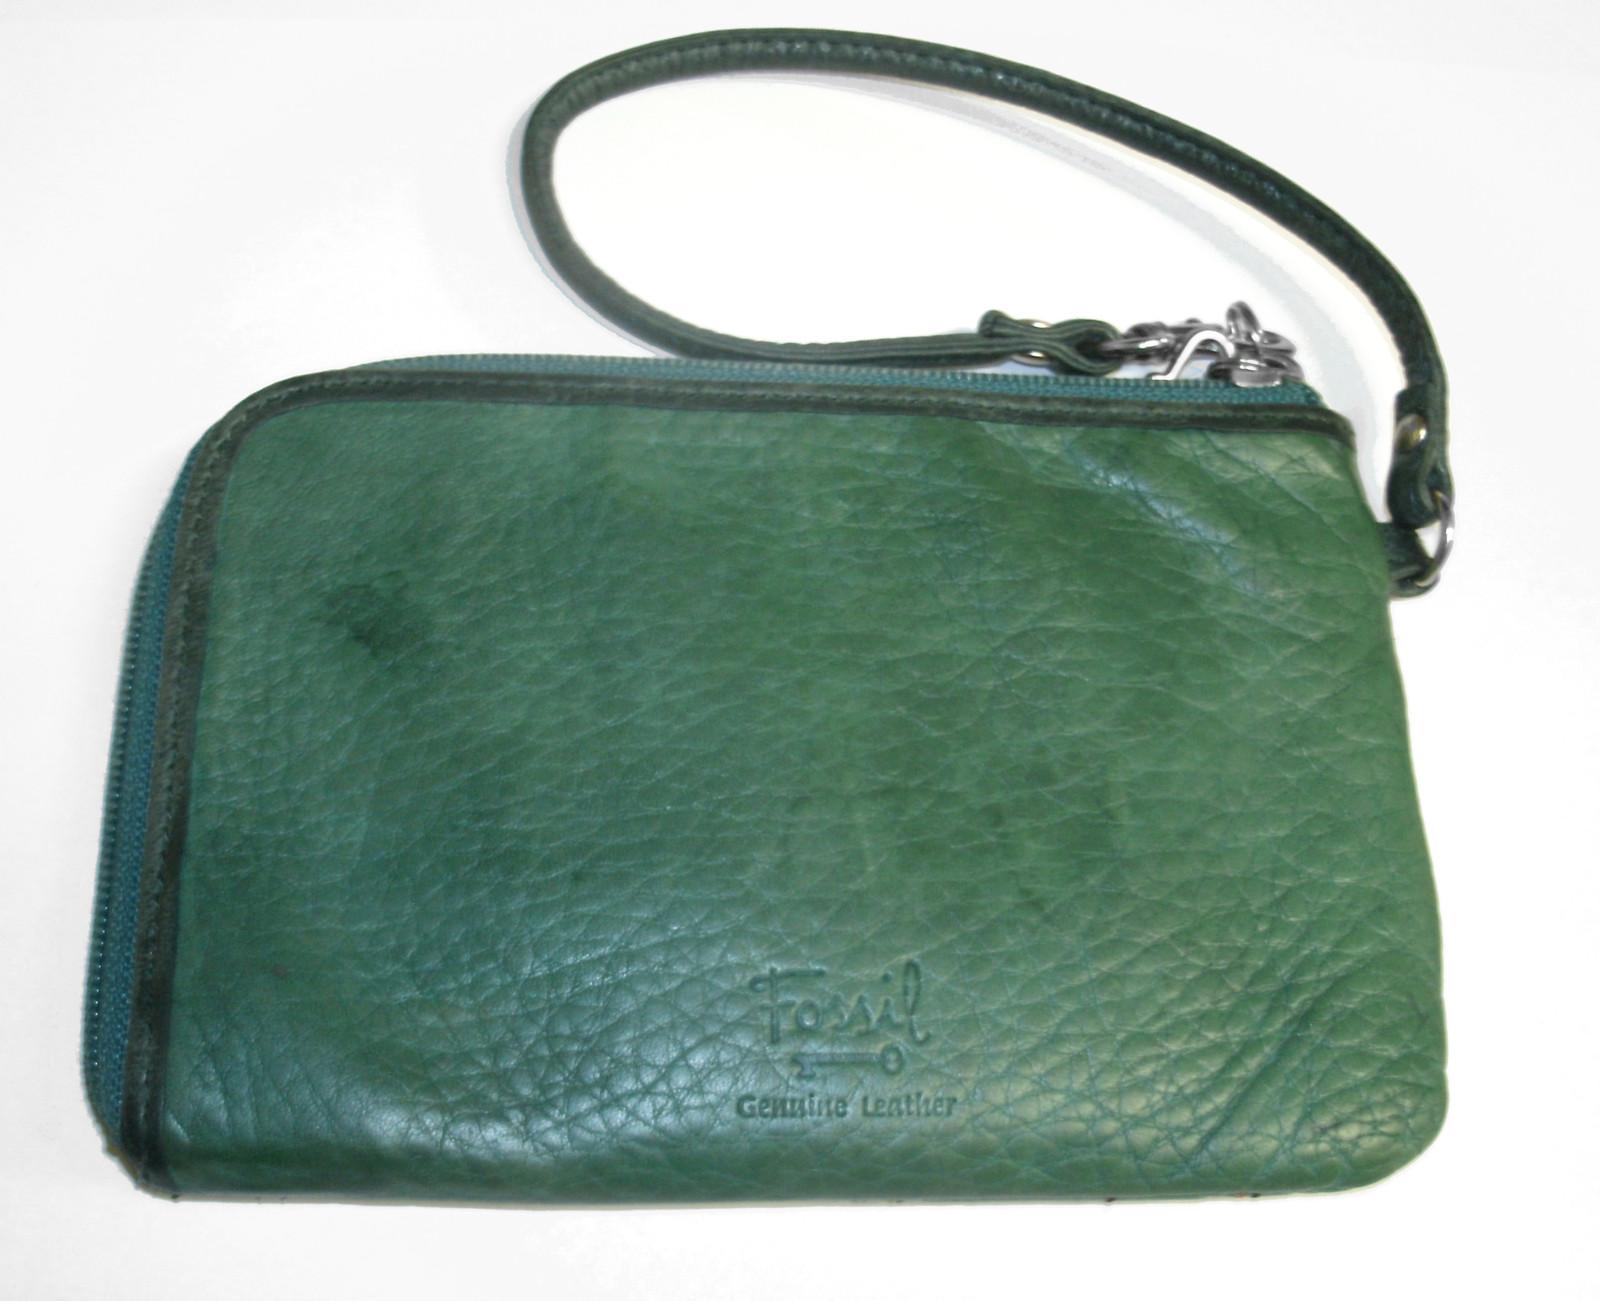 Fossil Leather Wristlet Birdhouses Green Applique Corner Zip Card Wallet Key